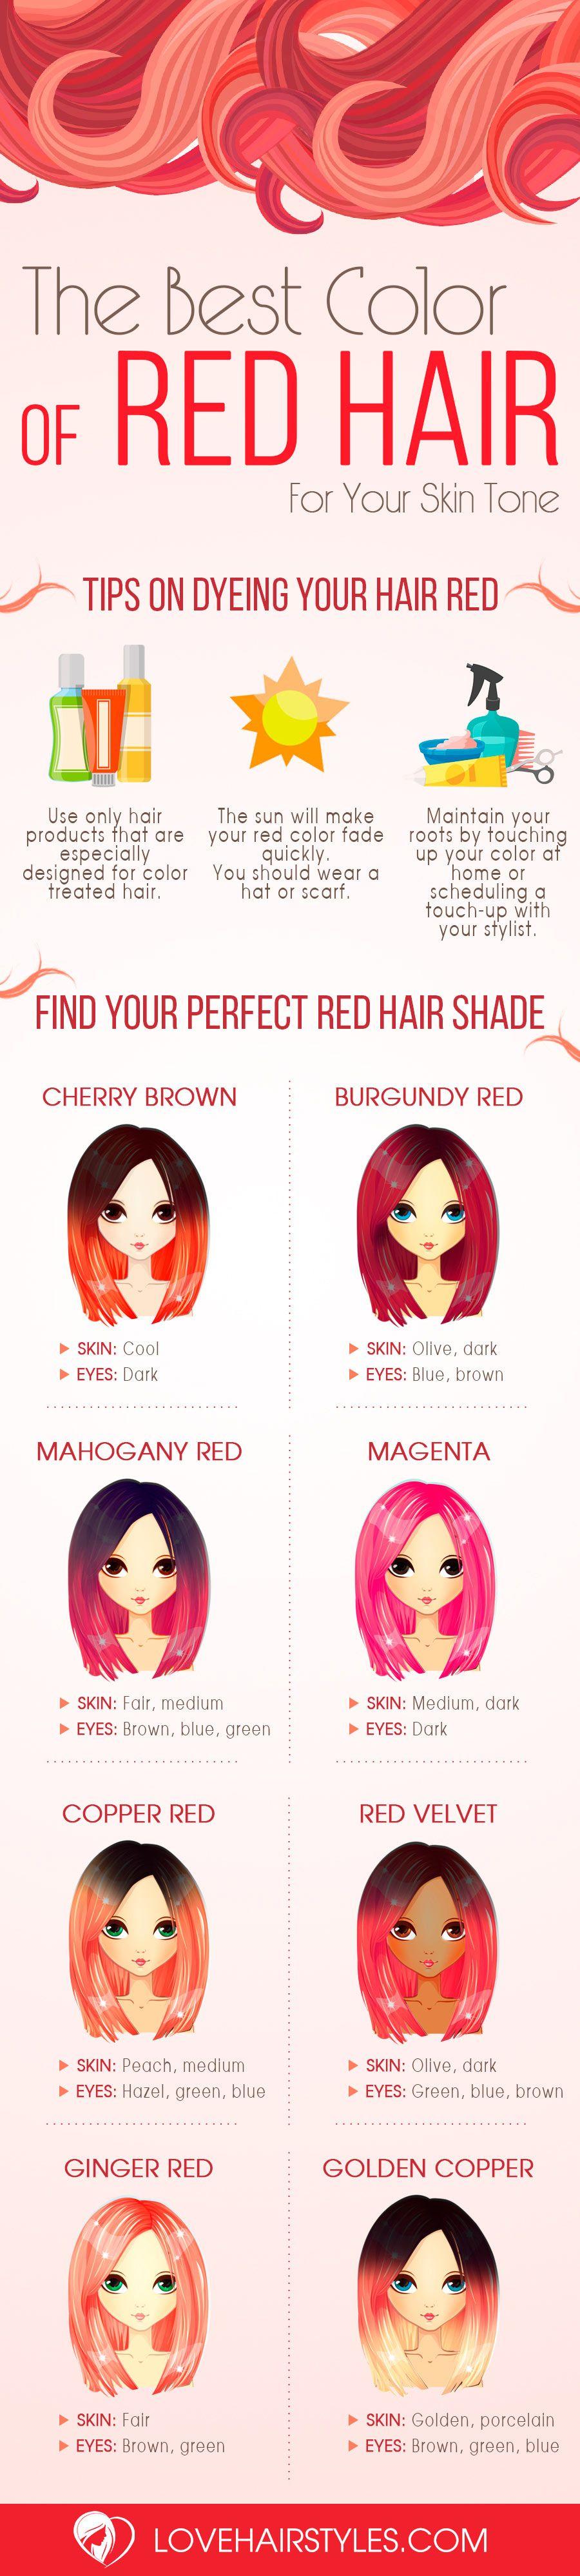 red hair colors for various skin tones red hair hair coloring